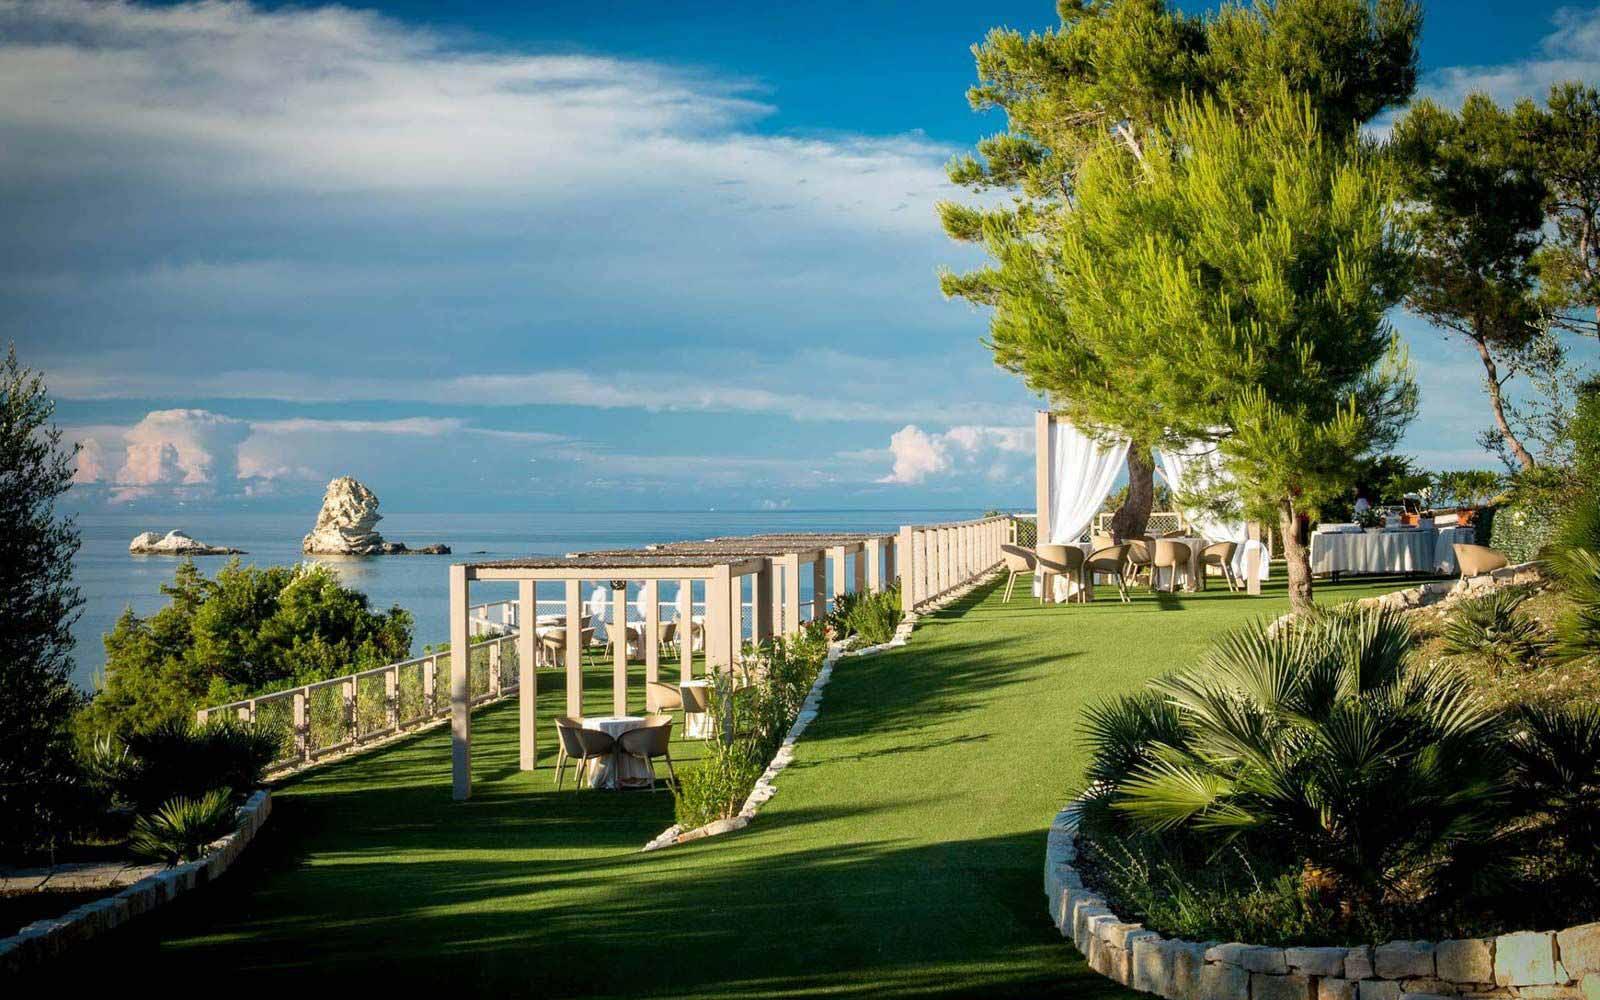 Gardens at the Gattarella Resort